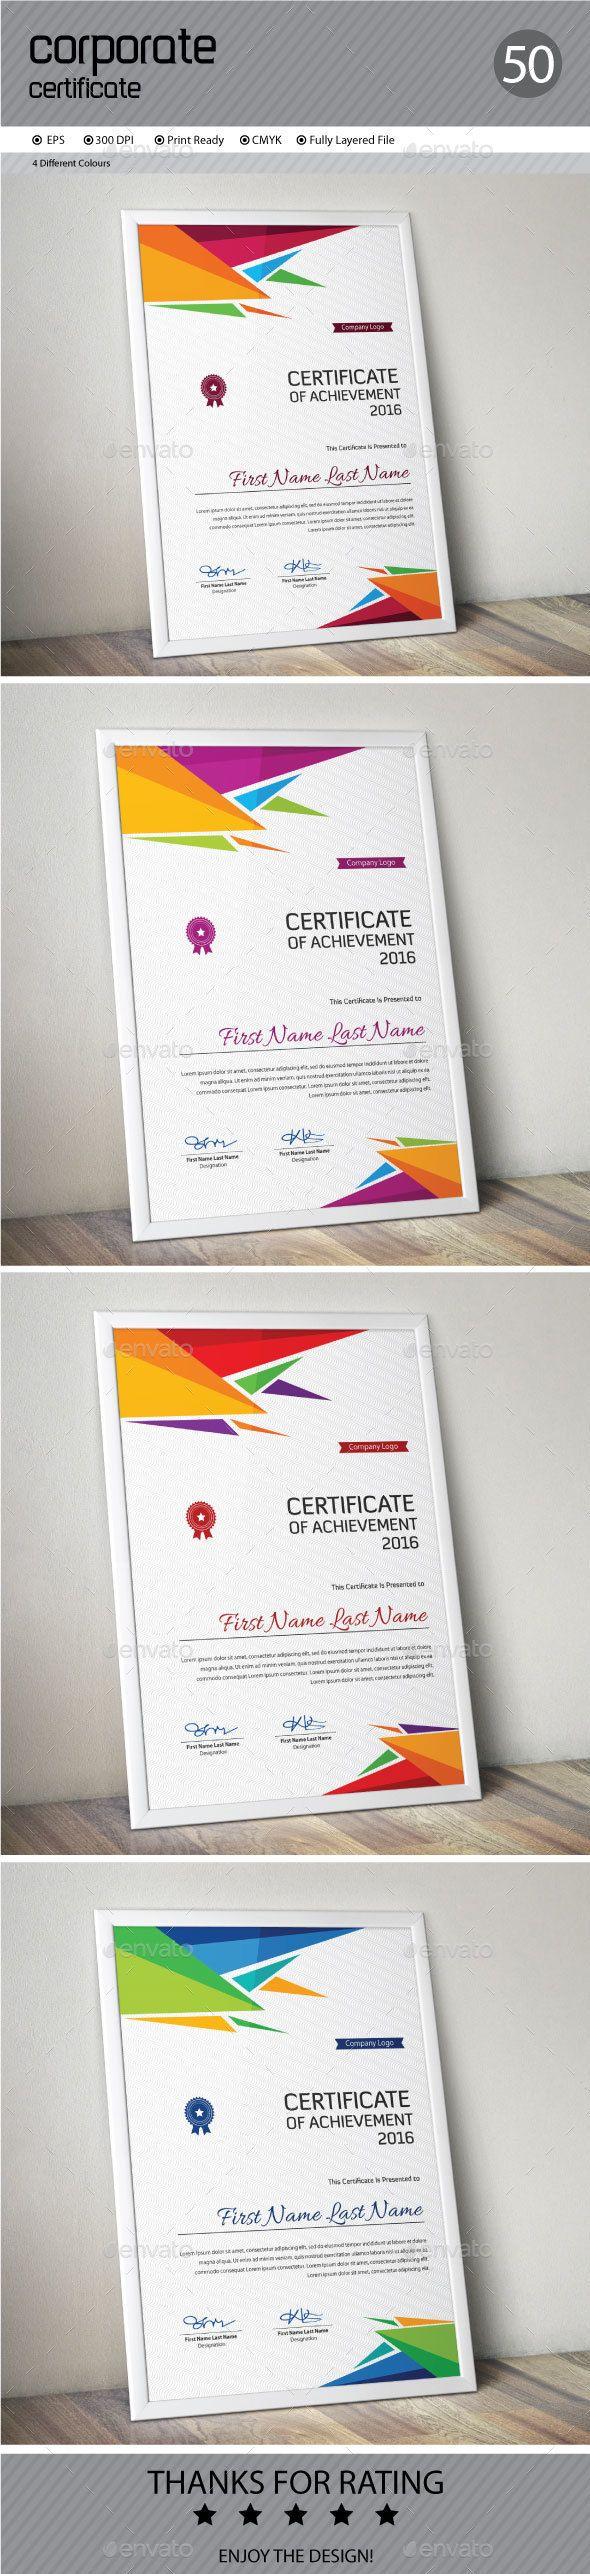 Certificate Template Vector EPS. Download here: http://graphicriver.net/item/certificate/14459520?ref=ksioks